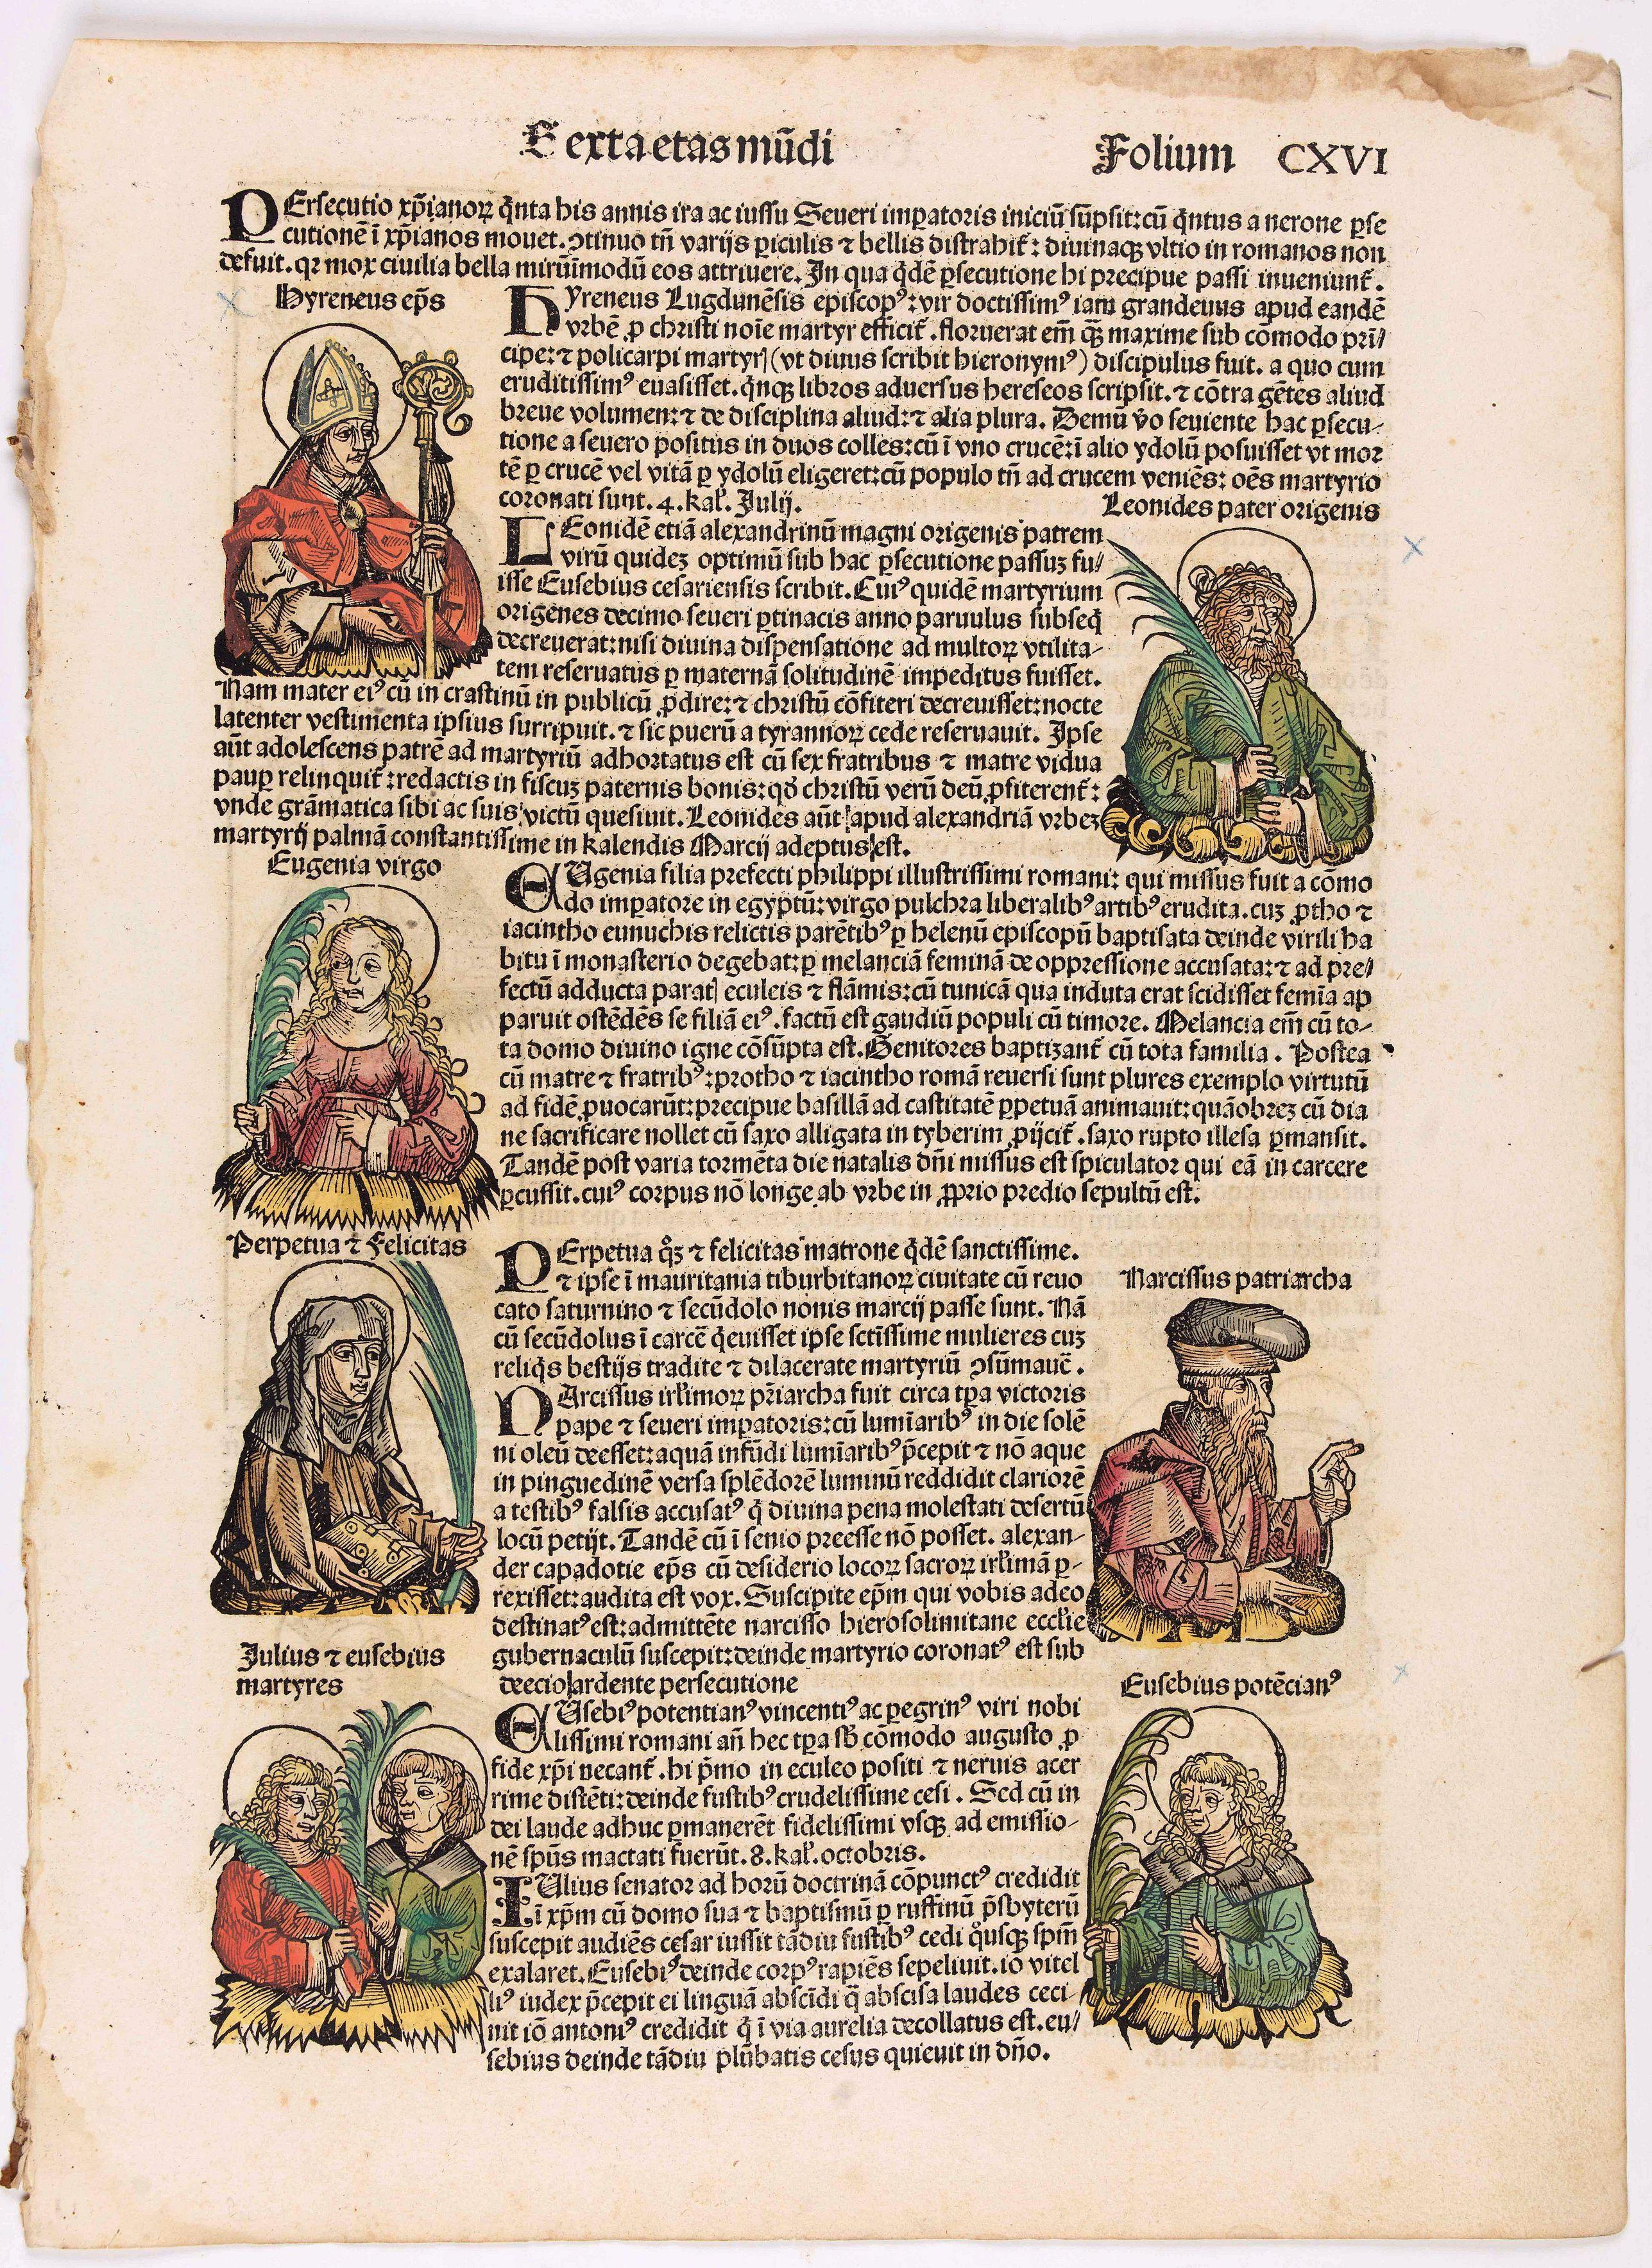 SCHEDEL, H. -  [Text page with illustrations of Saint Cecilia, Kings, Queens, Saints and Popes.] Sexta Etas Mundi. Folium. CXVI.